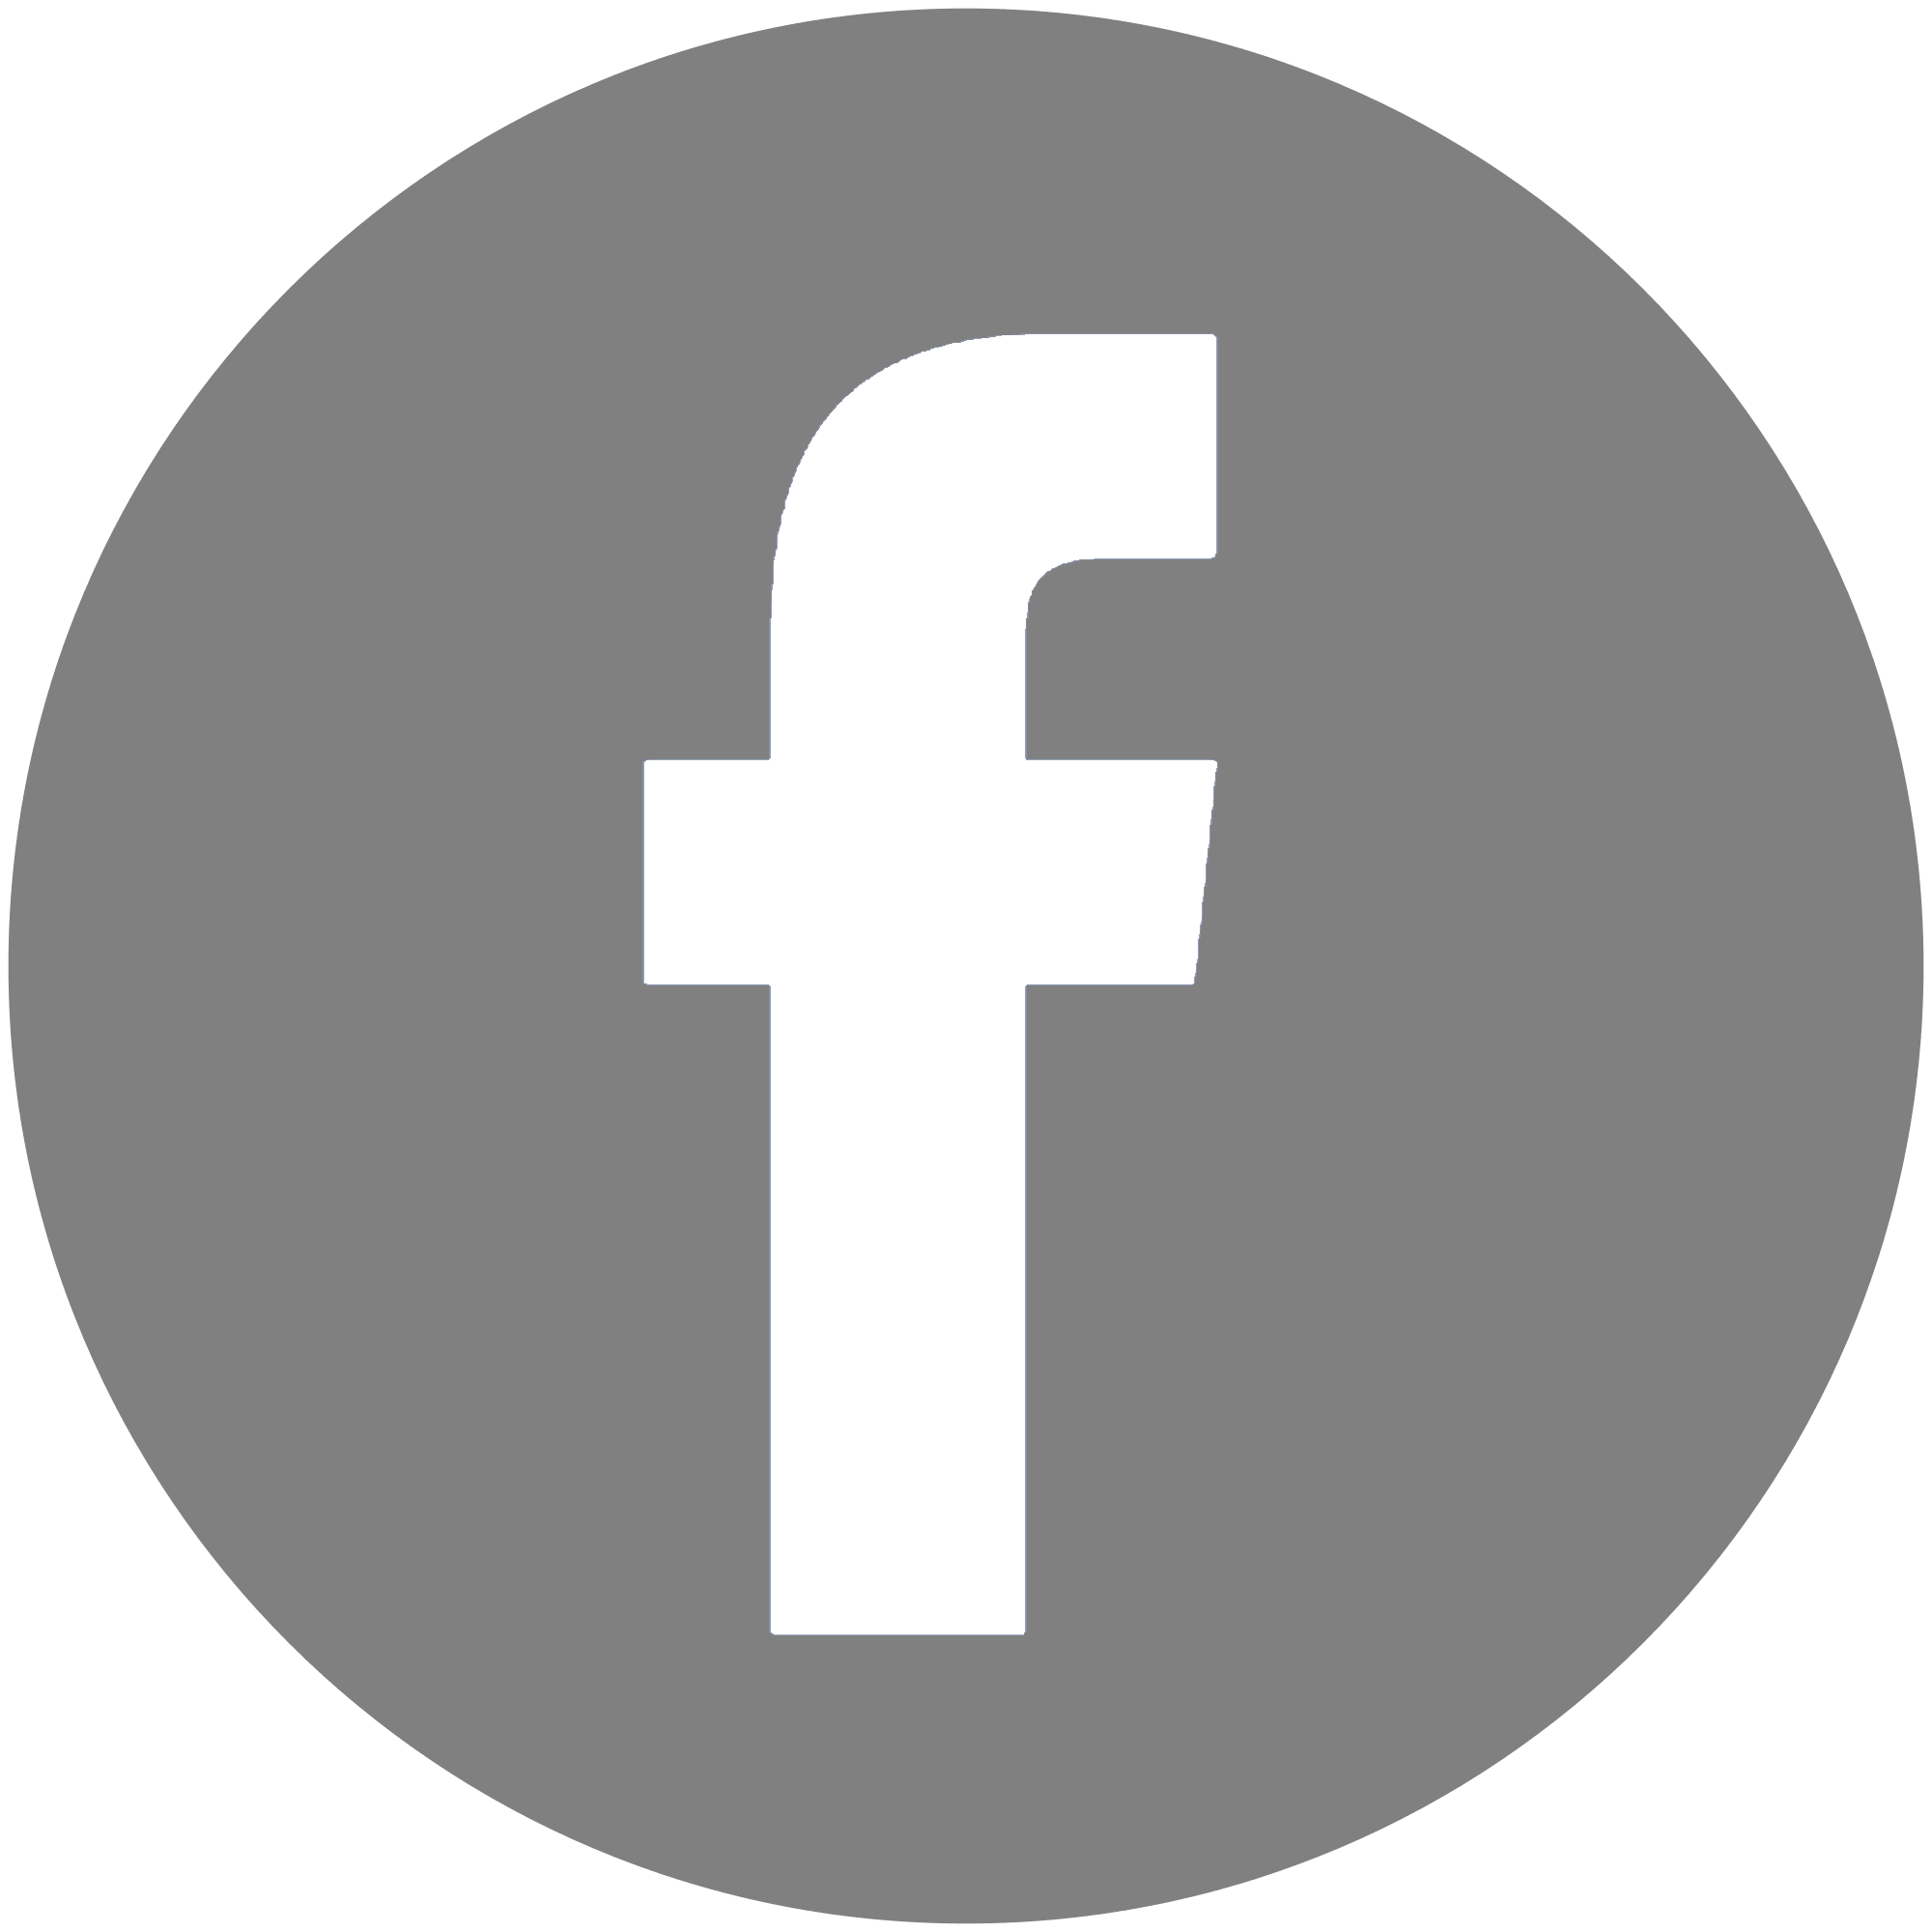 Facebook clipart monochrome.  e ee c